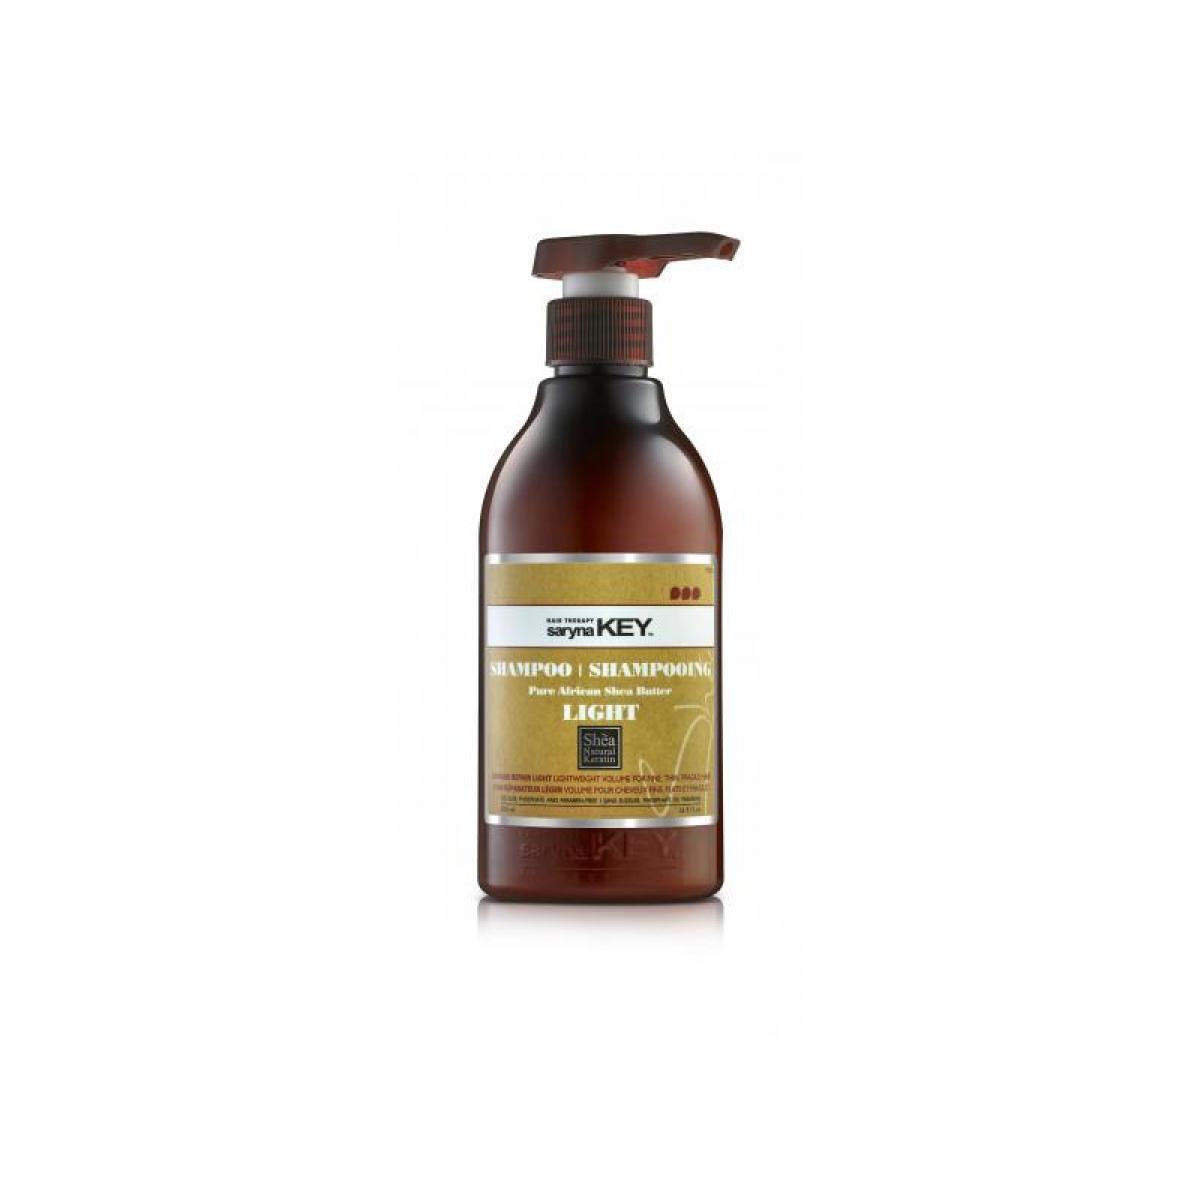 Saryna Key Восстанавливающий шампунь на масле Ши Damage Repair Light shampoo 500мл